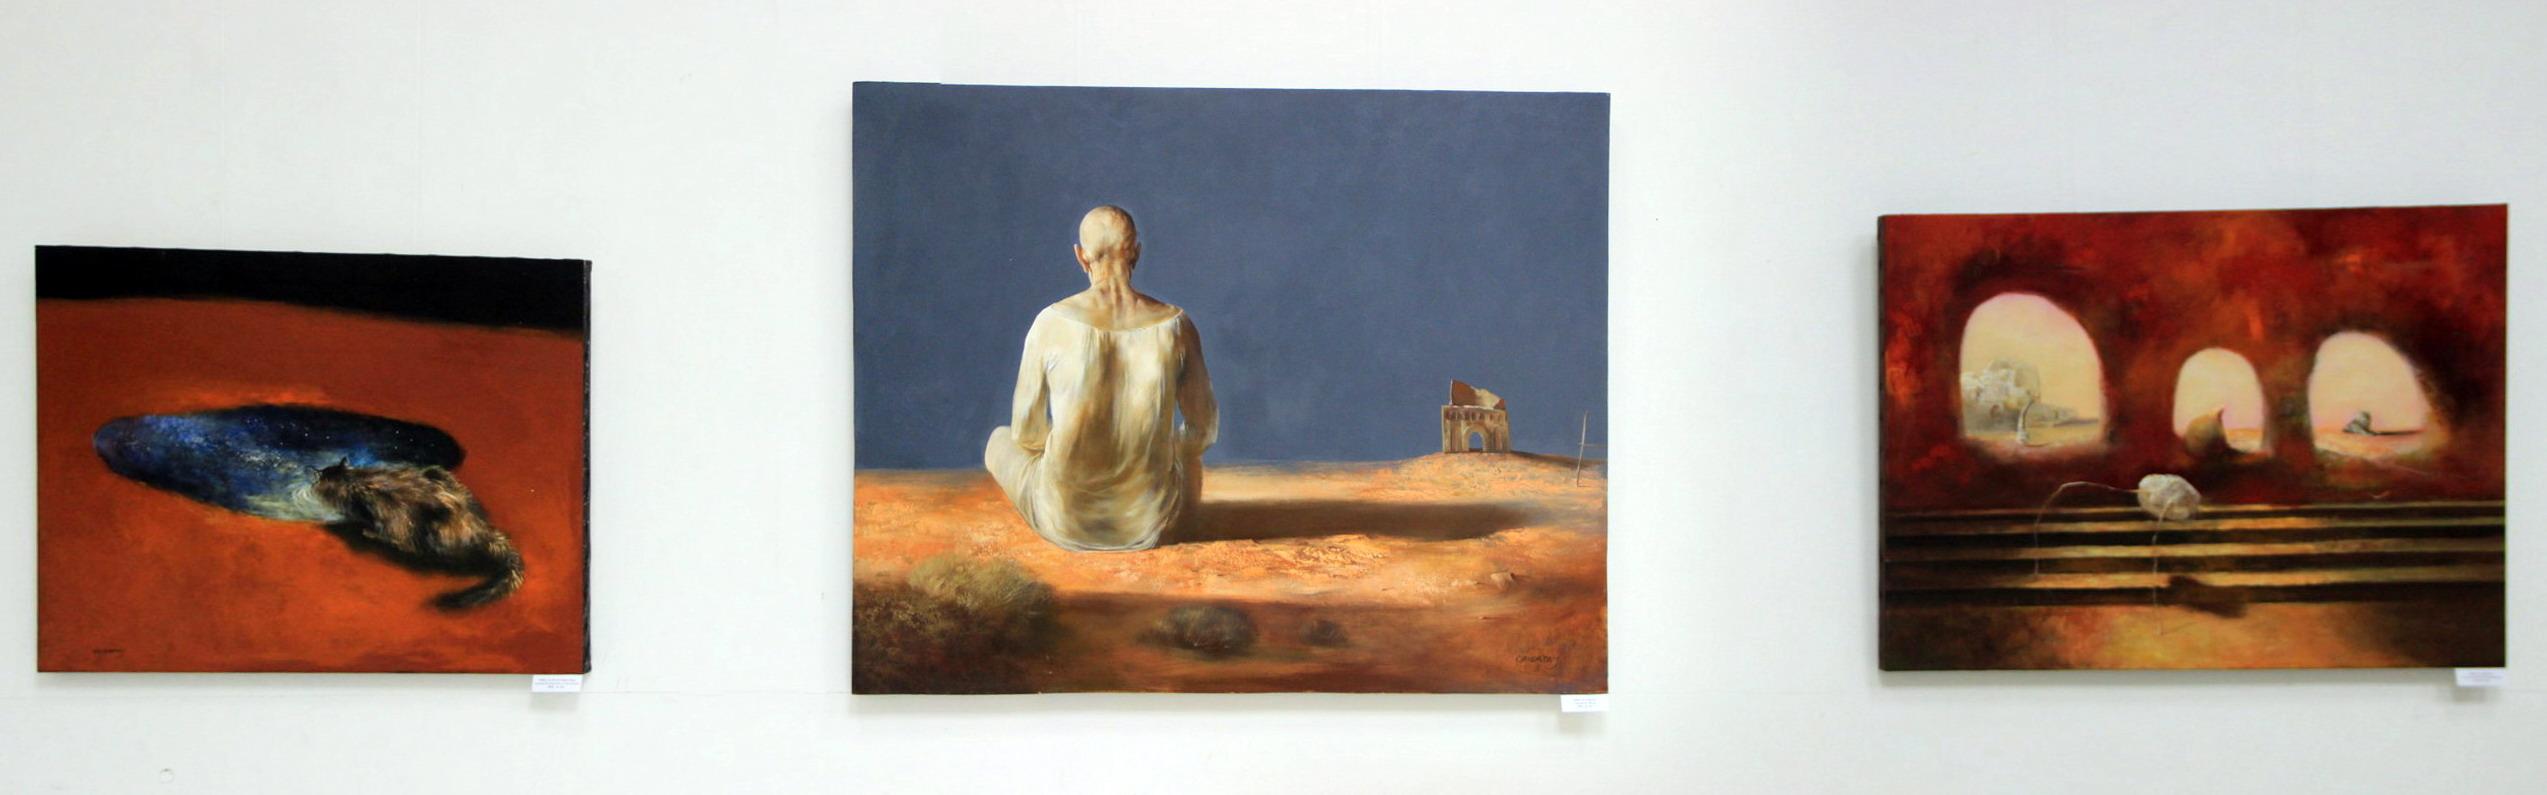 Адылов К. Экспозиция картин